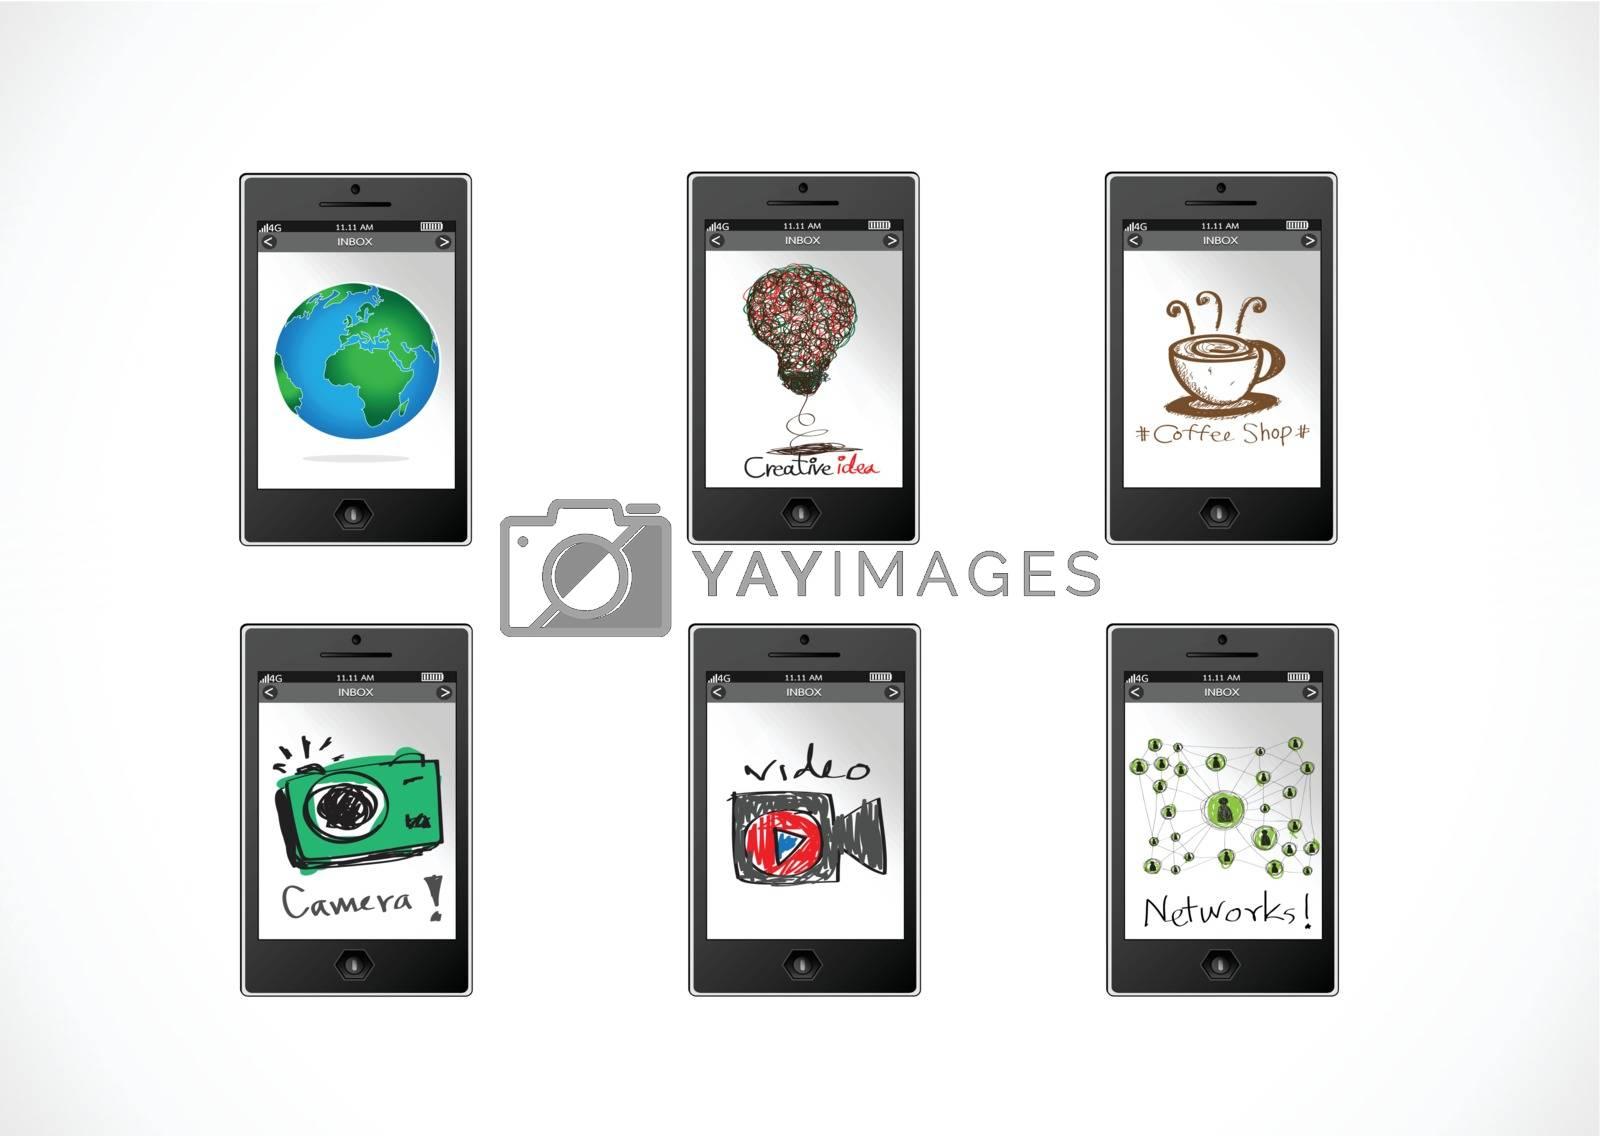 mobile apps concept idea illustration by kiddaikiddee